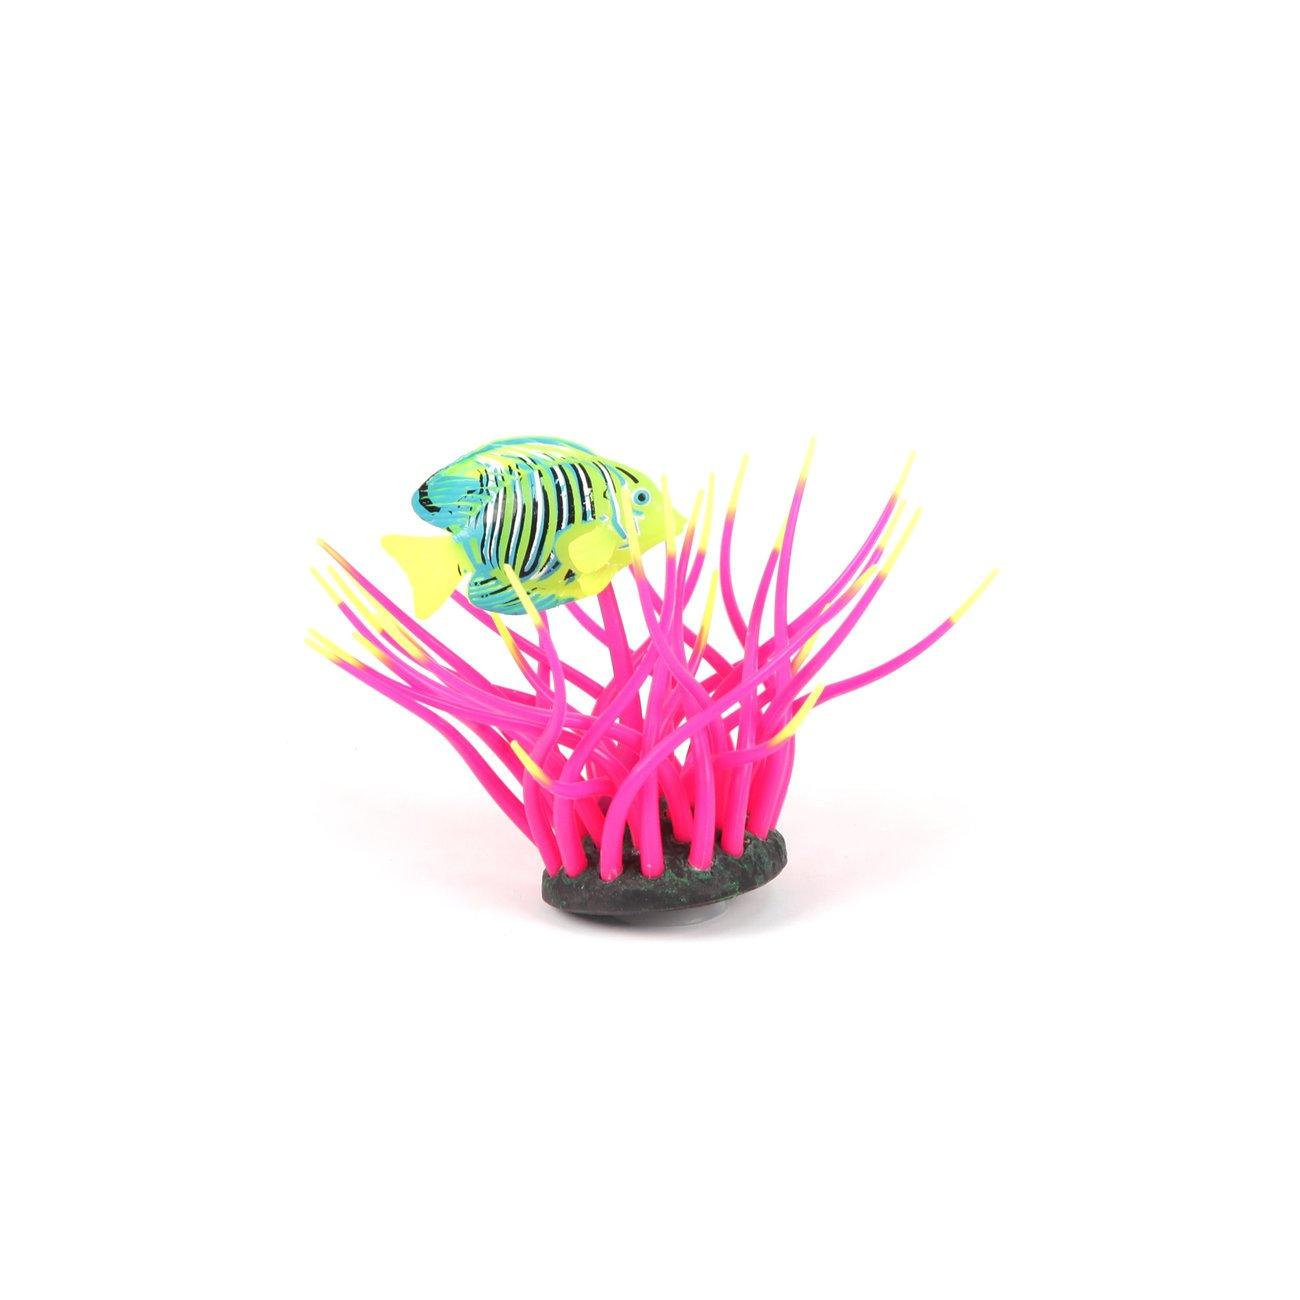 Aquatlantis Aqua Glow Anemone, mit Doktorfisch, rosa